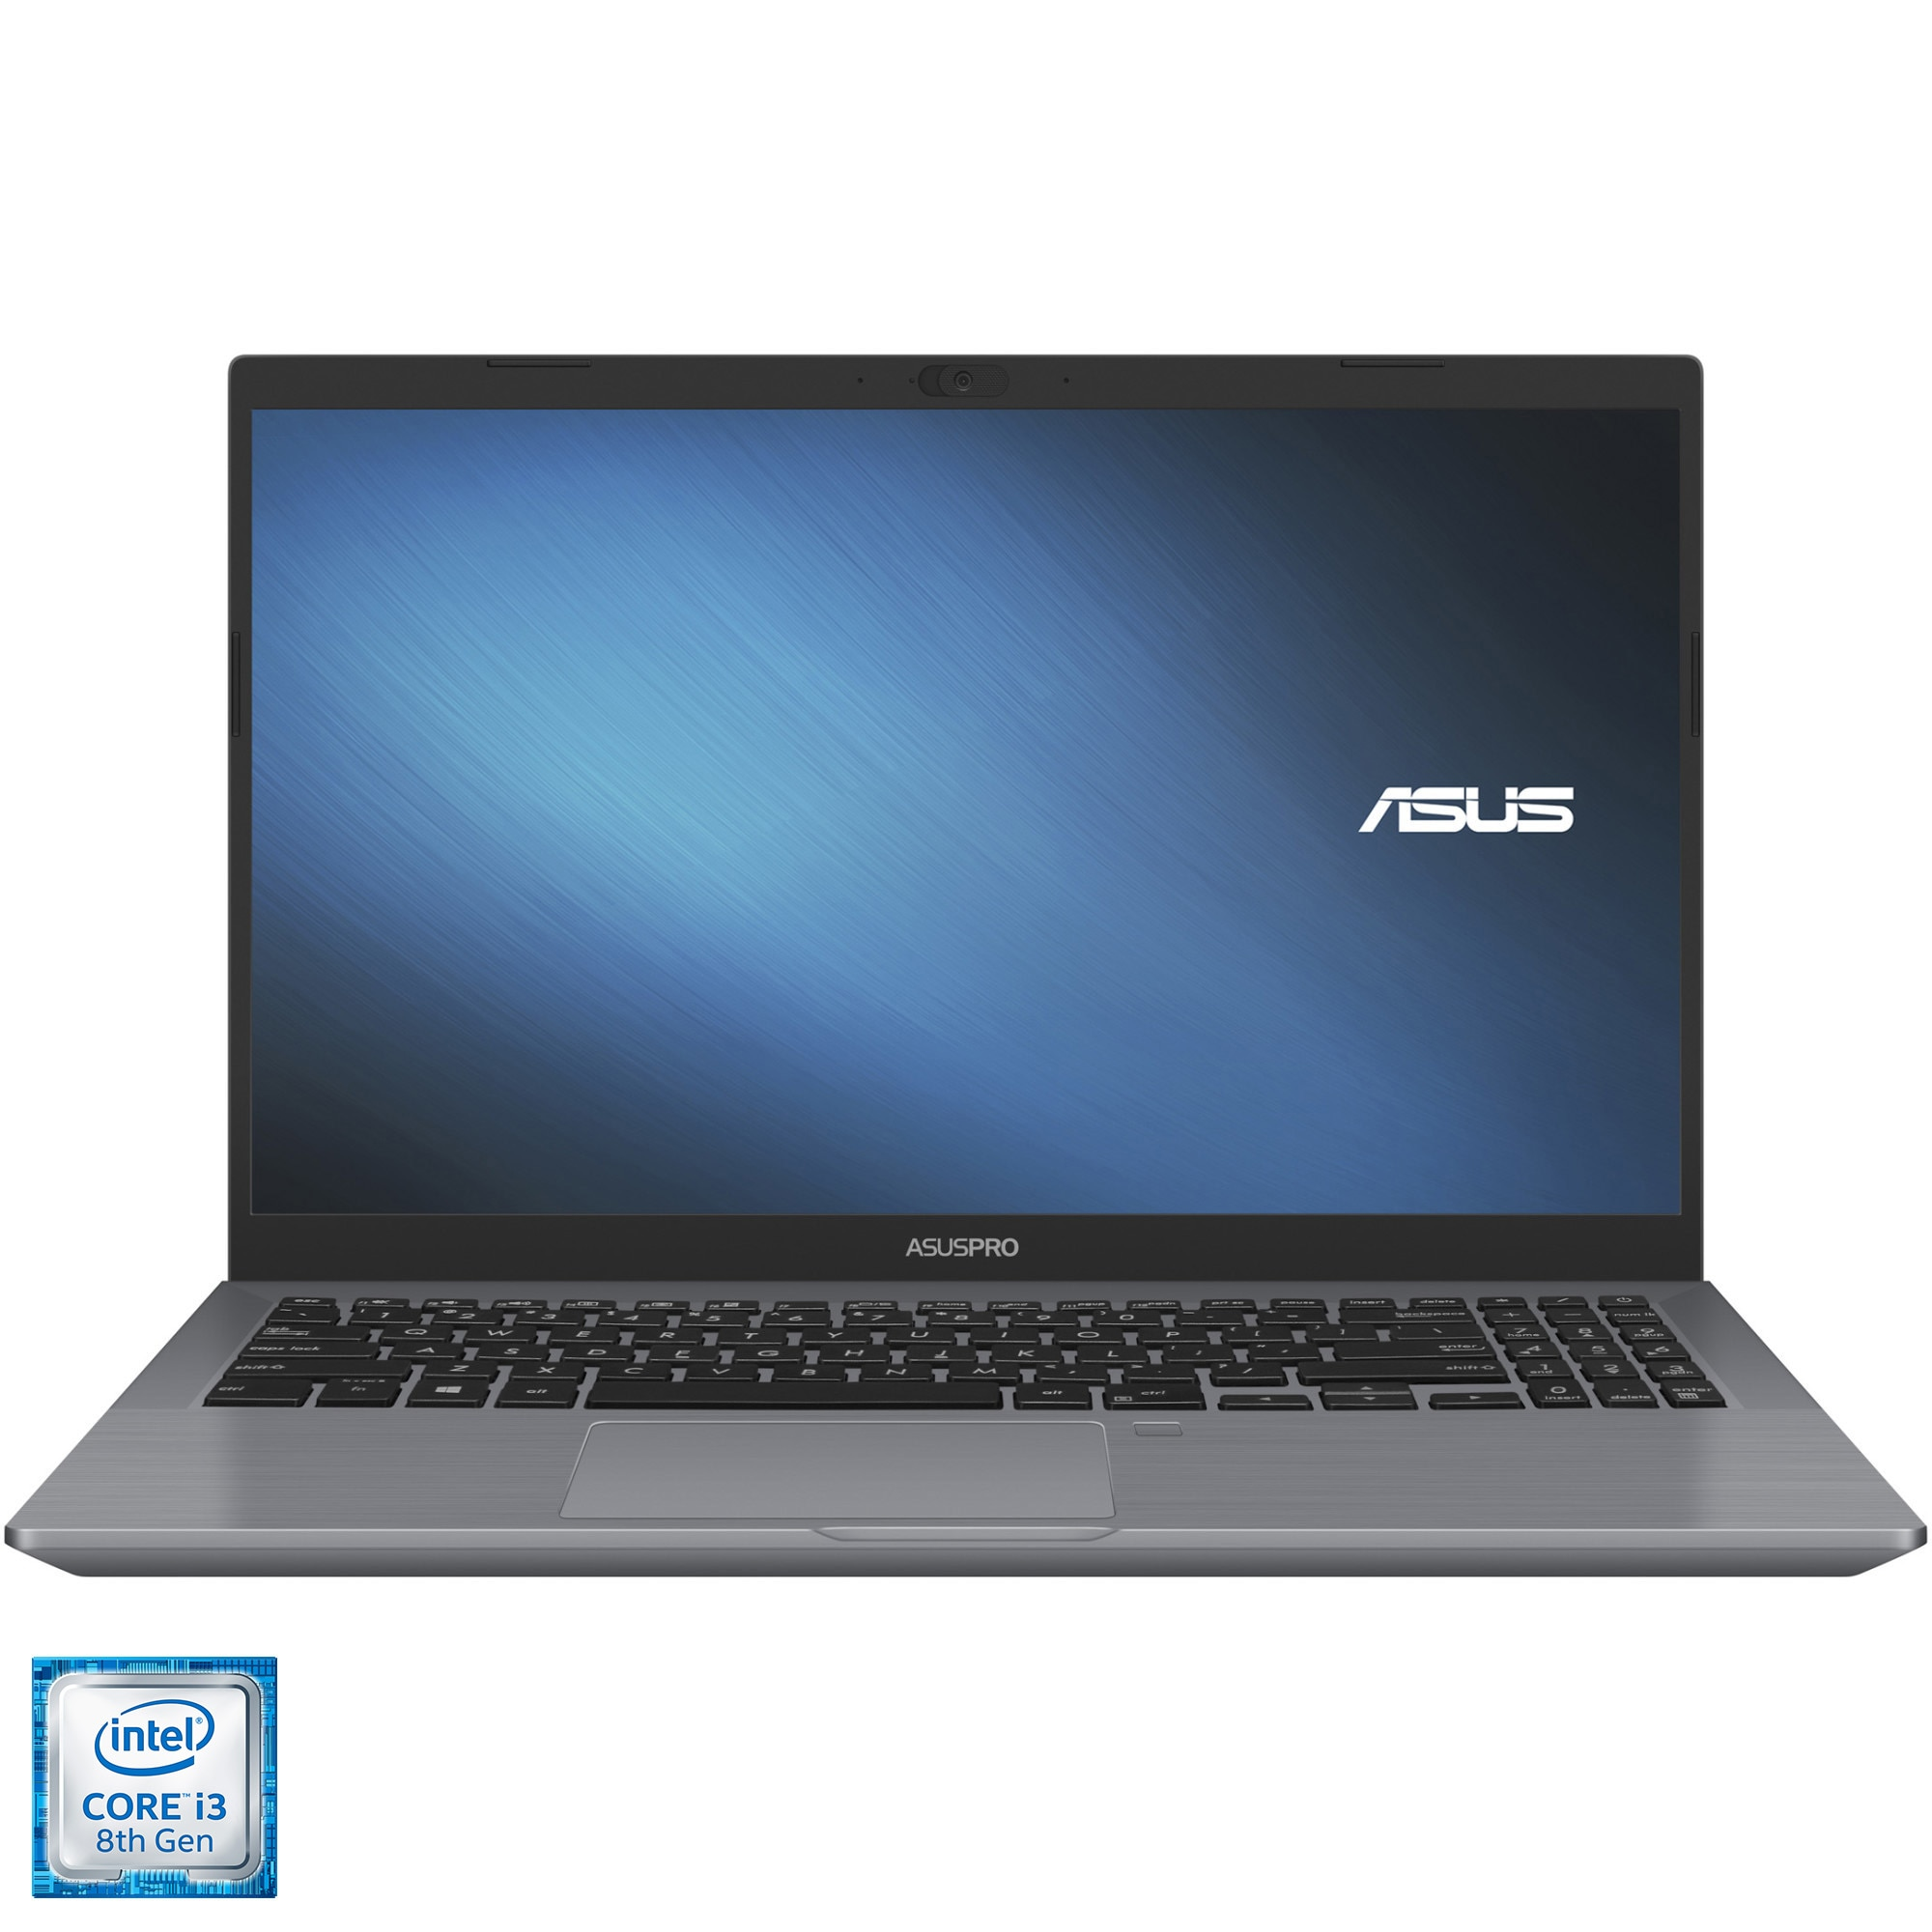 "Fotografie Laptop ASUS ExpertBook P3540FA cu procesor Intel Core i3-8145U, 15.6"", HD, 8GB, 256GB SSD, Intel® UHD Graphics, Endless OS, Grey"